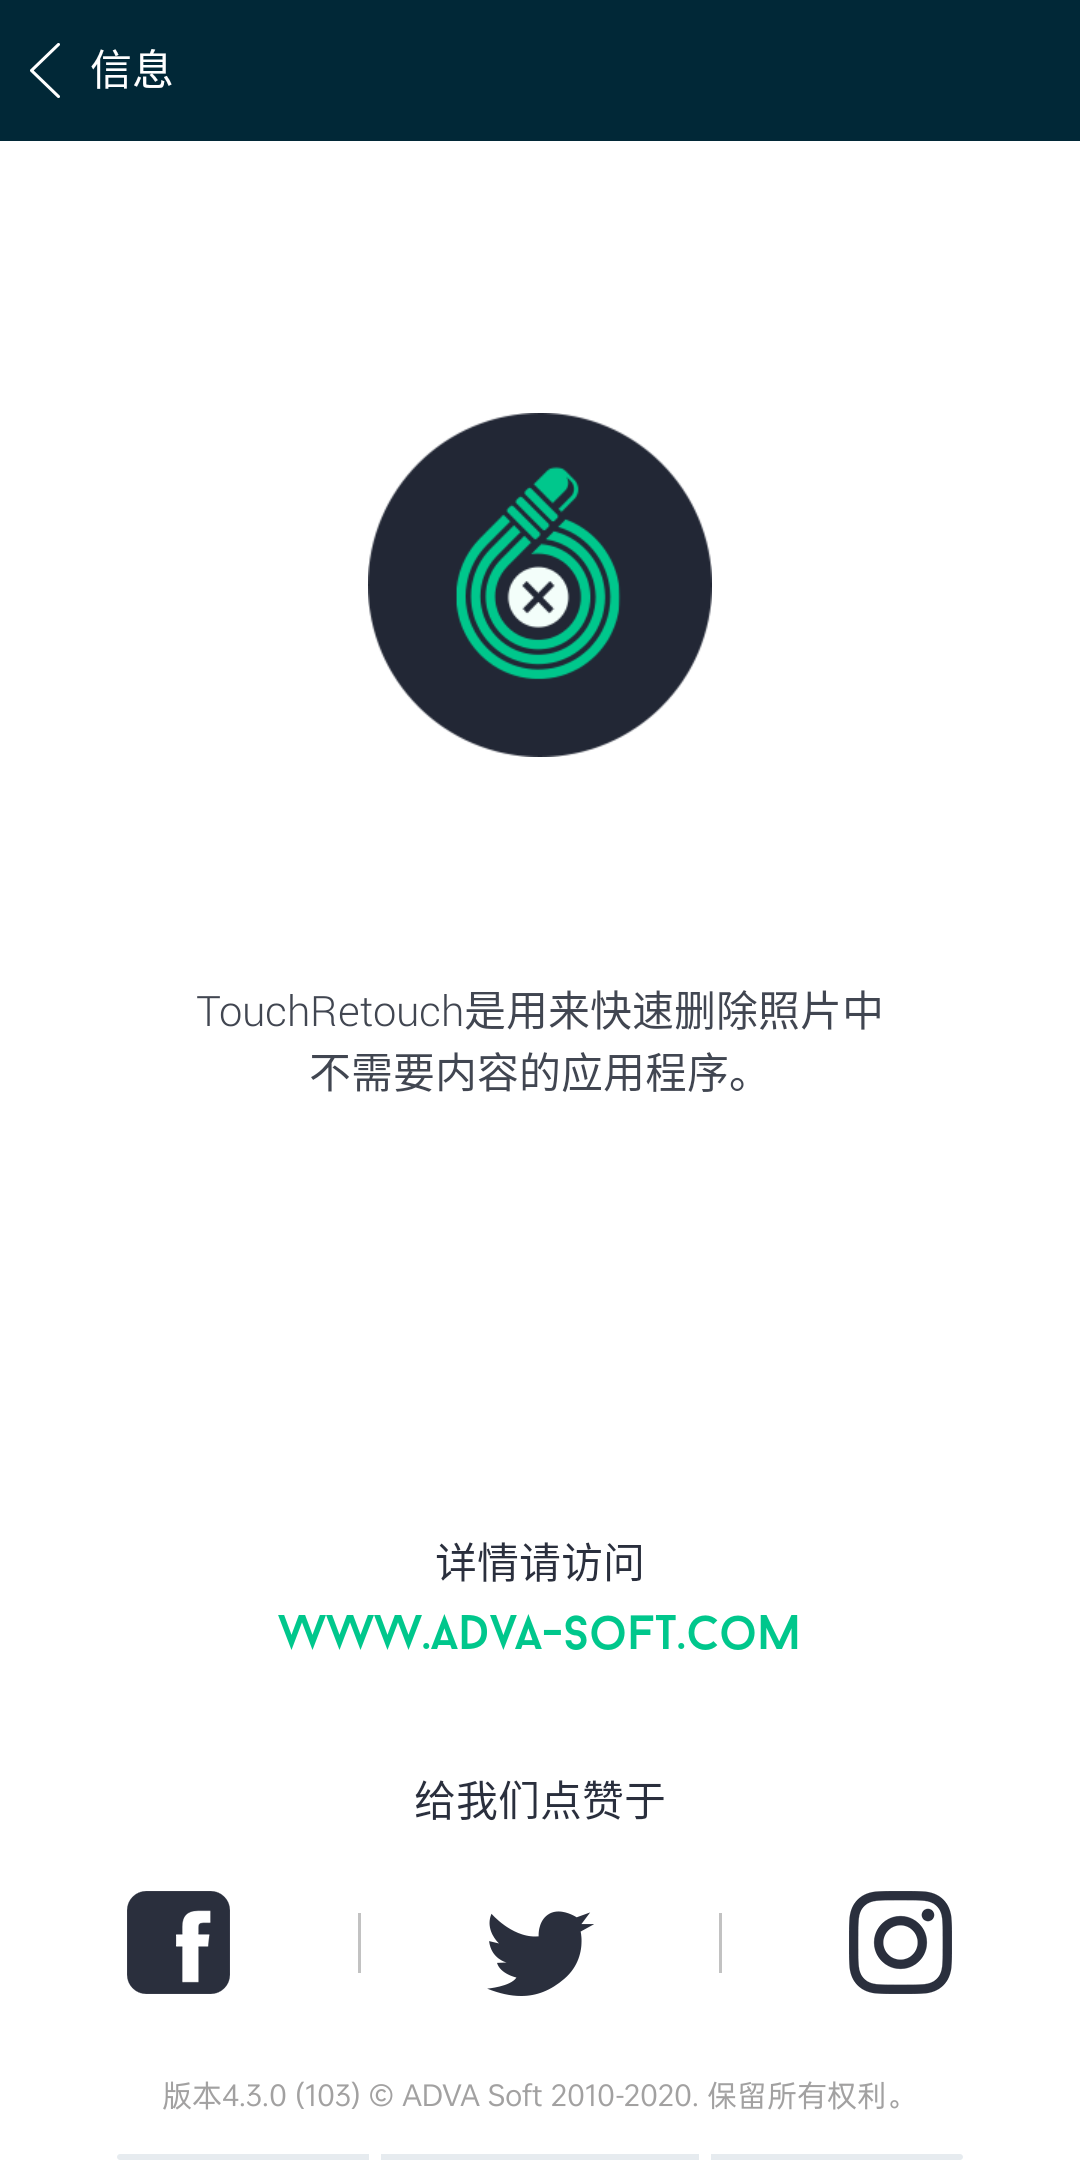 Retouch_v4.3.0付费修改版